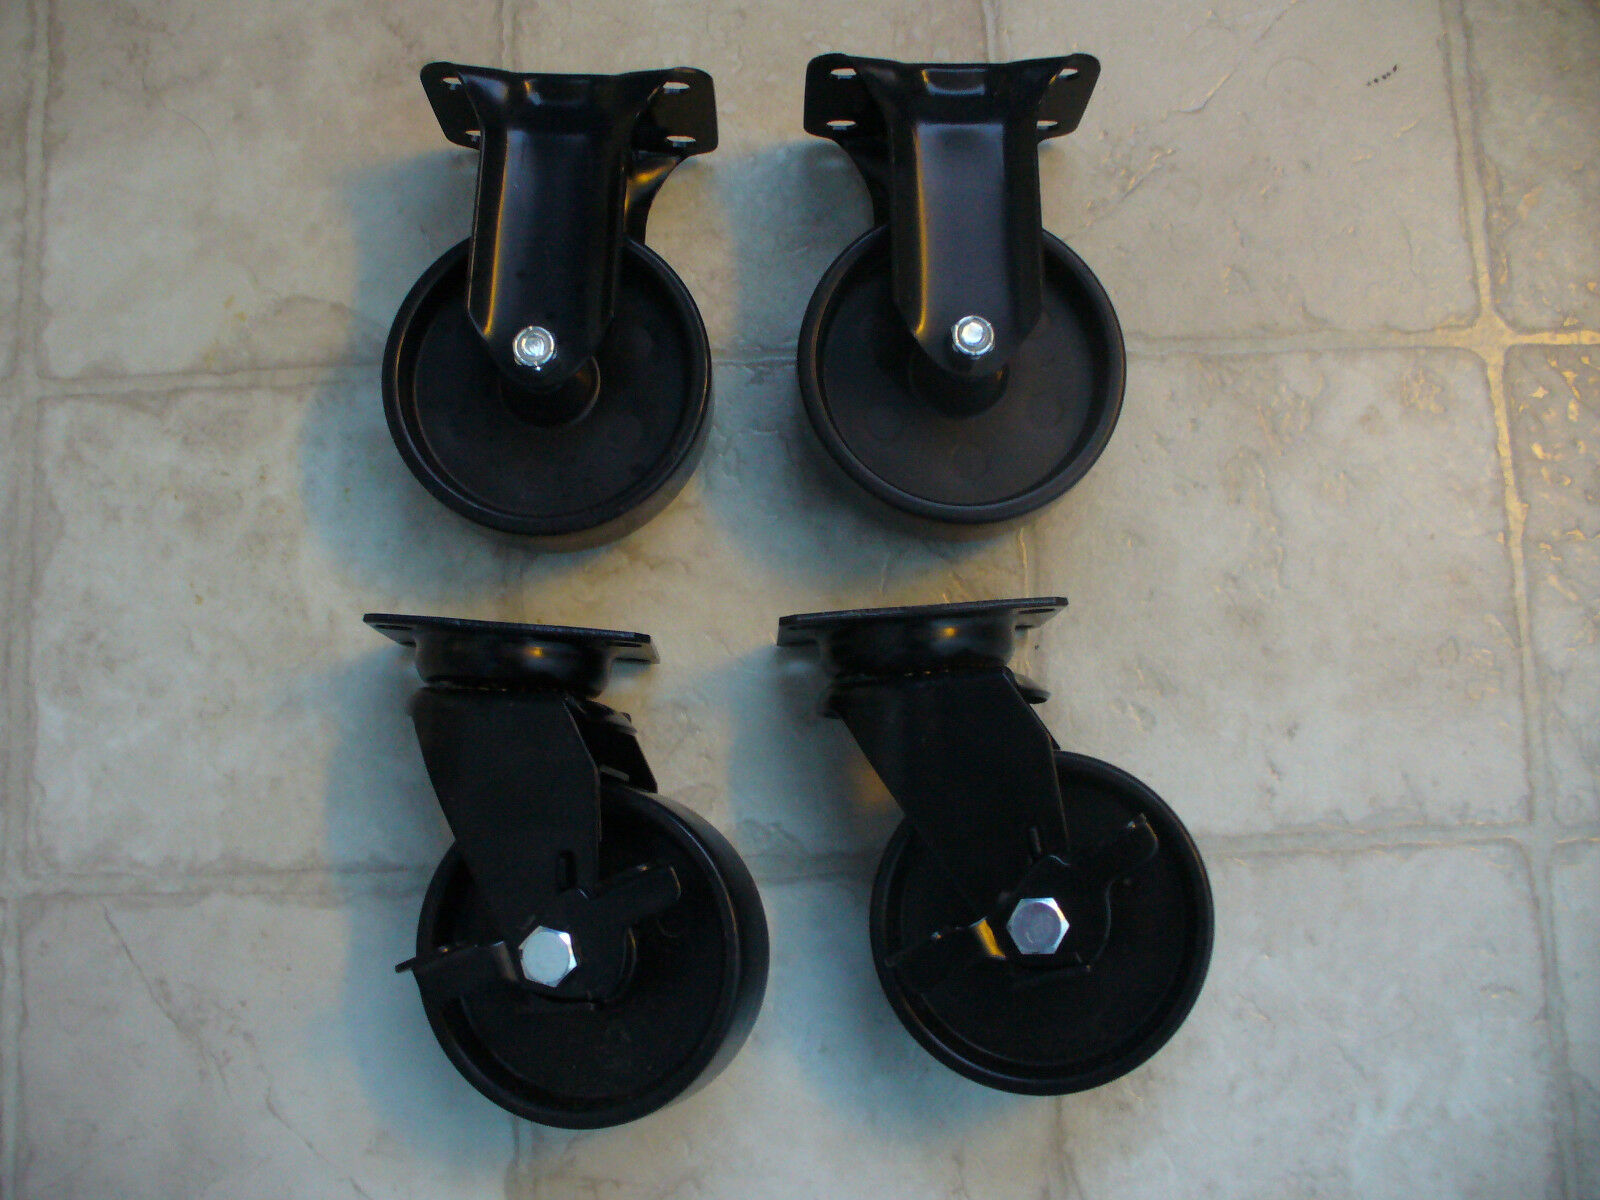 Husky Tool Box Casters 4 3 8'' Diameter